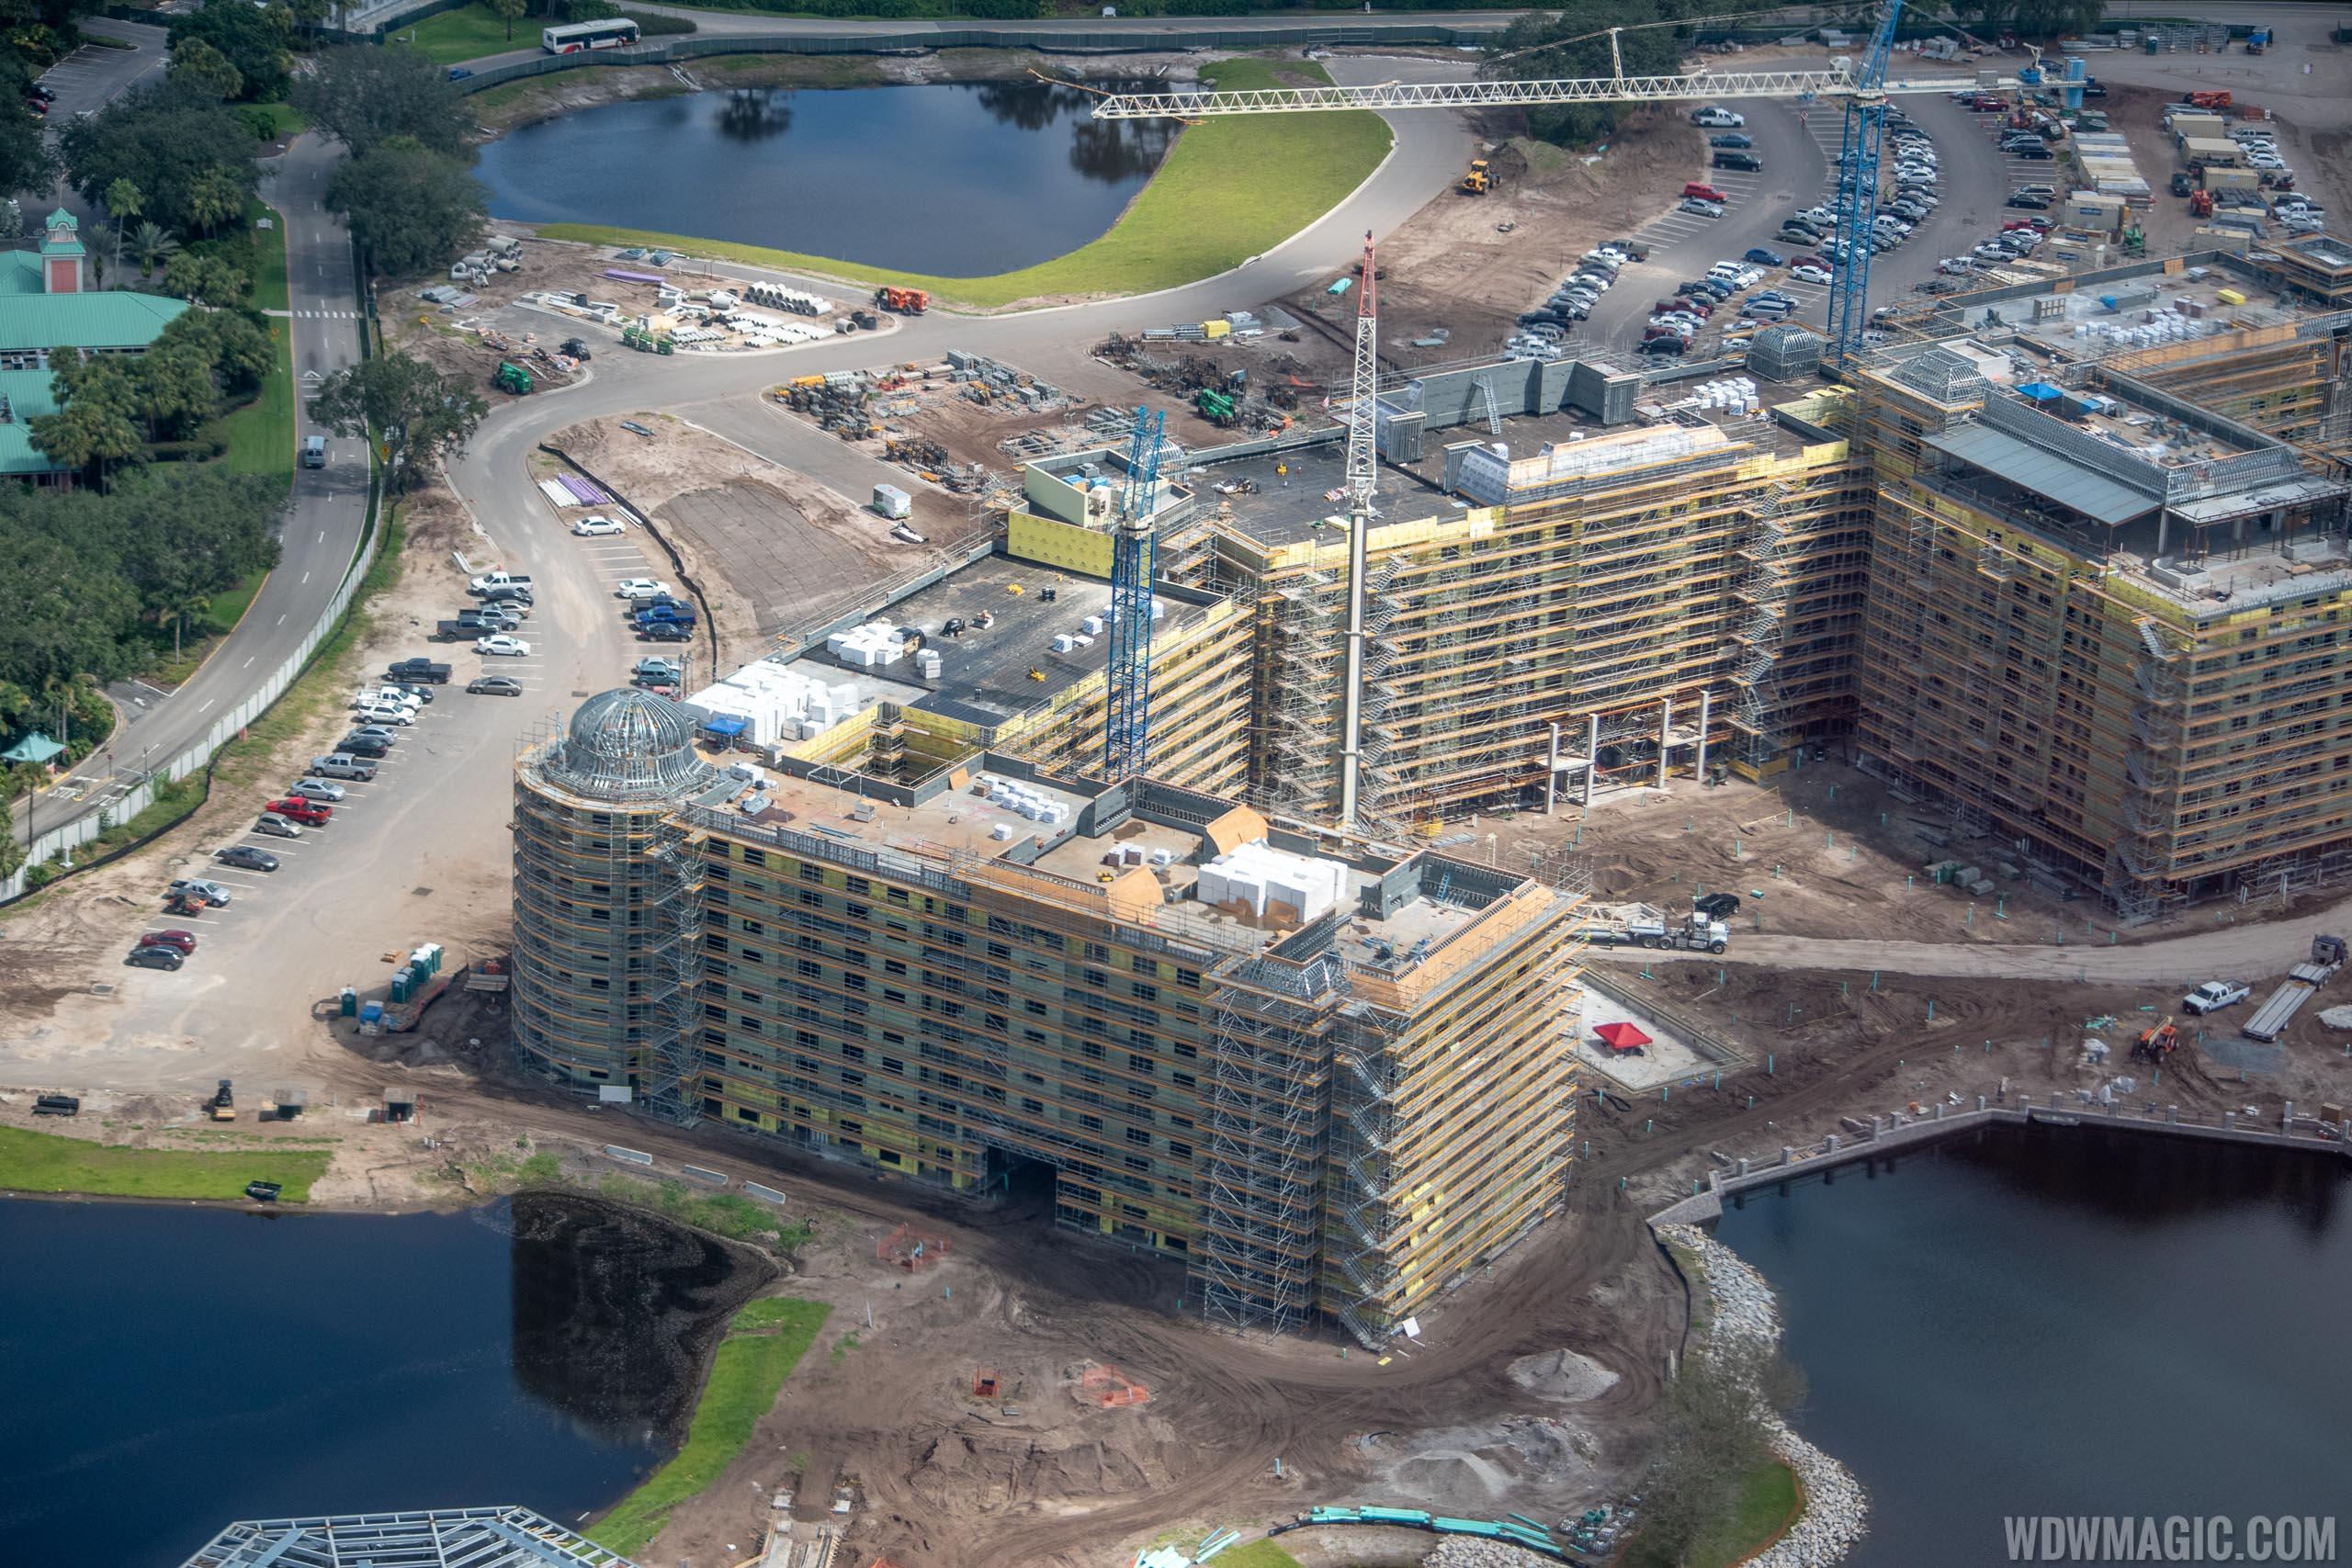 Disney Riviera Resort from the air